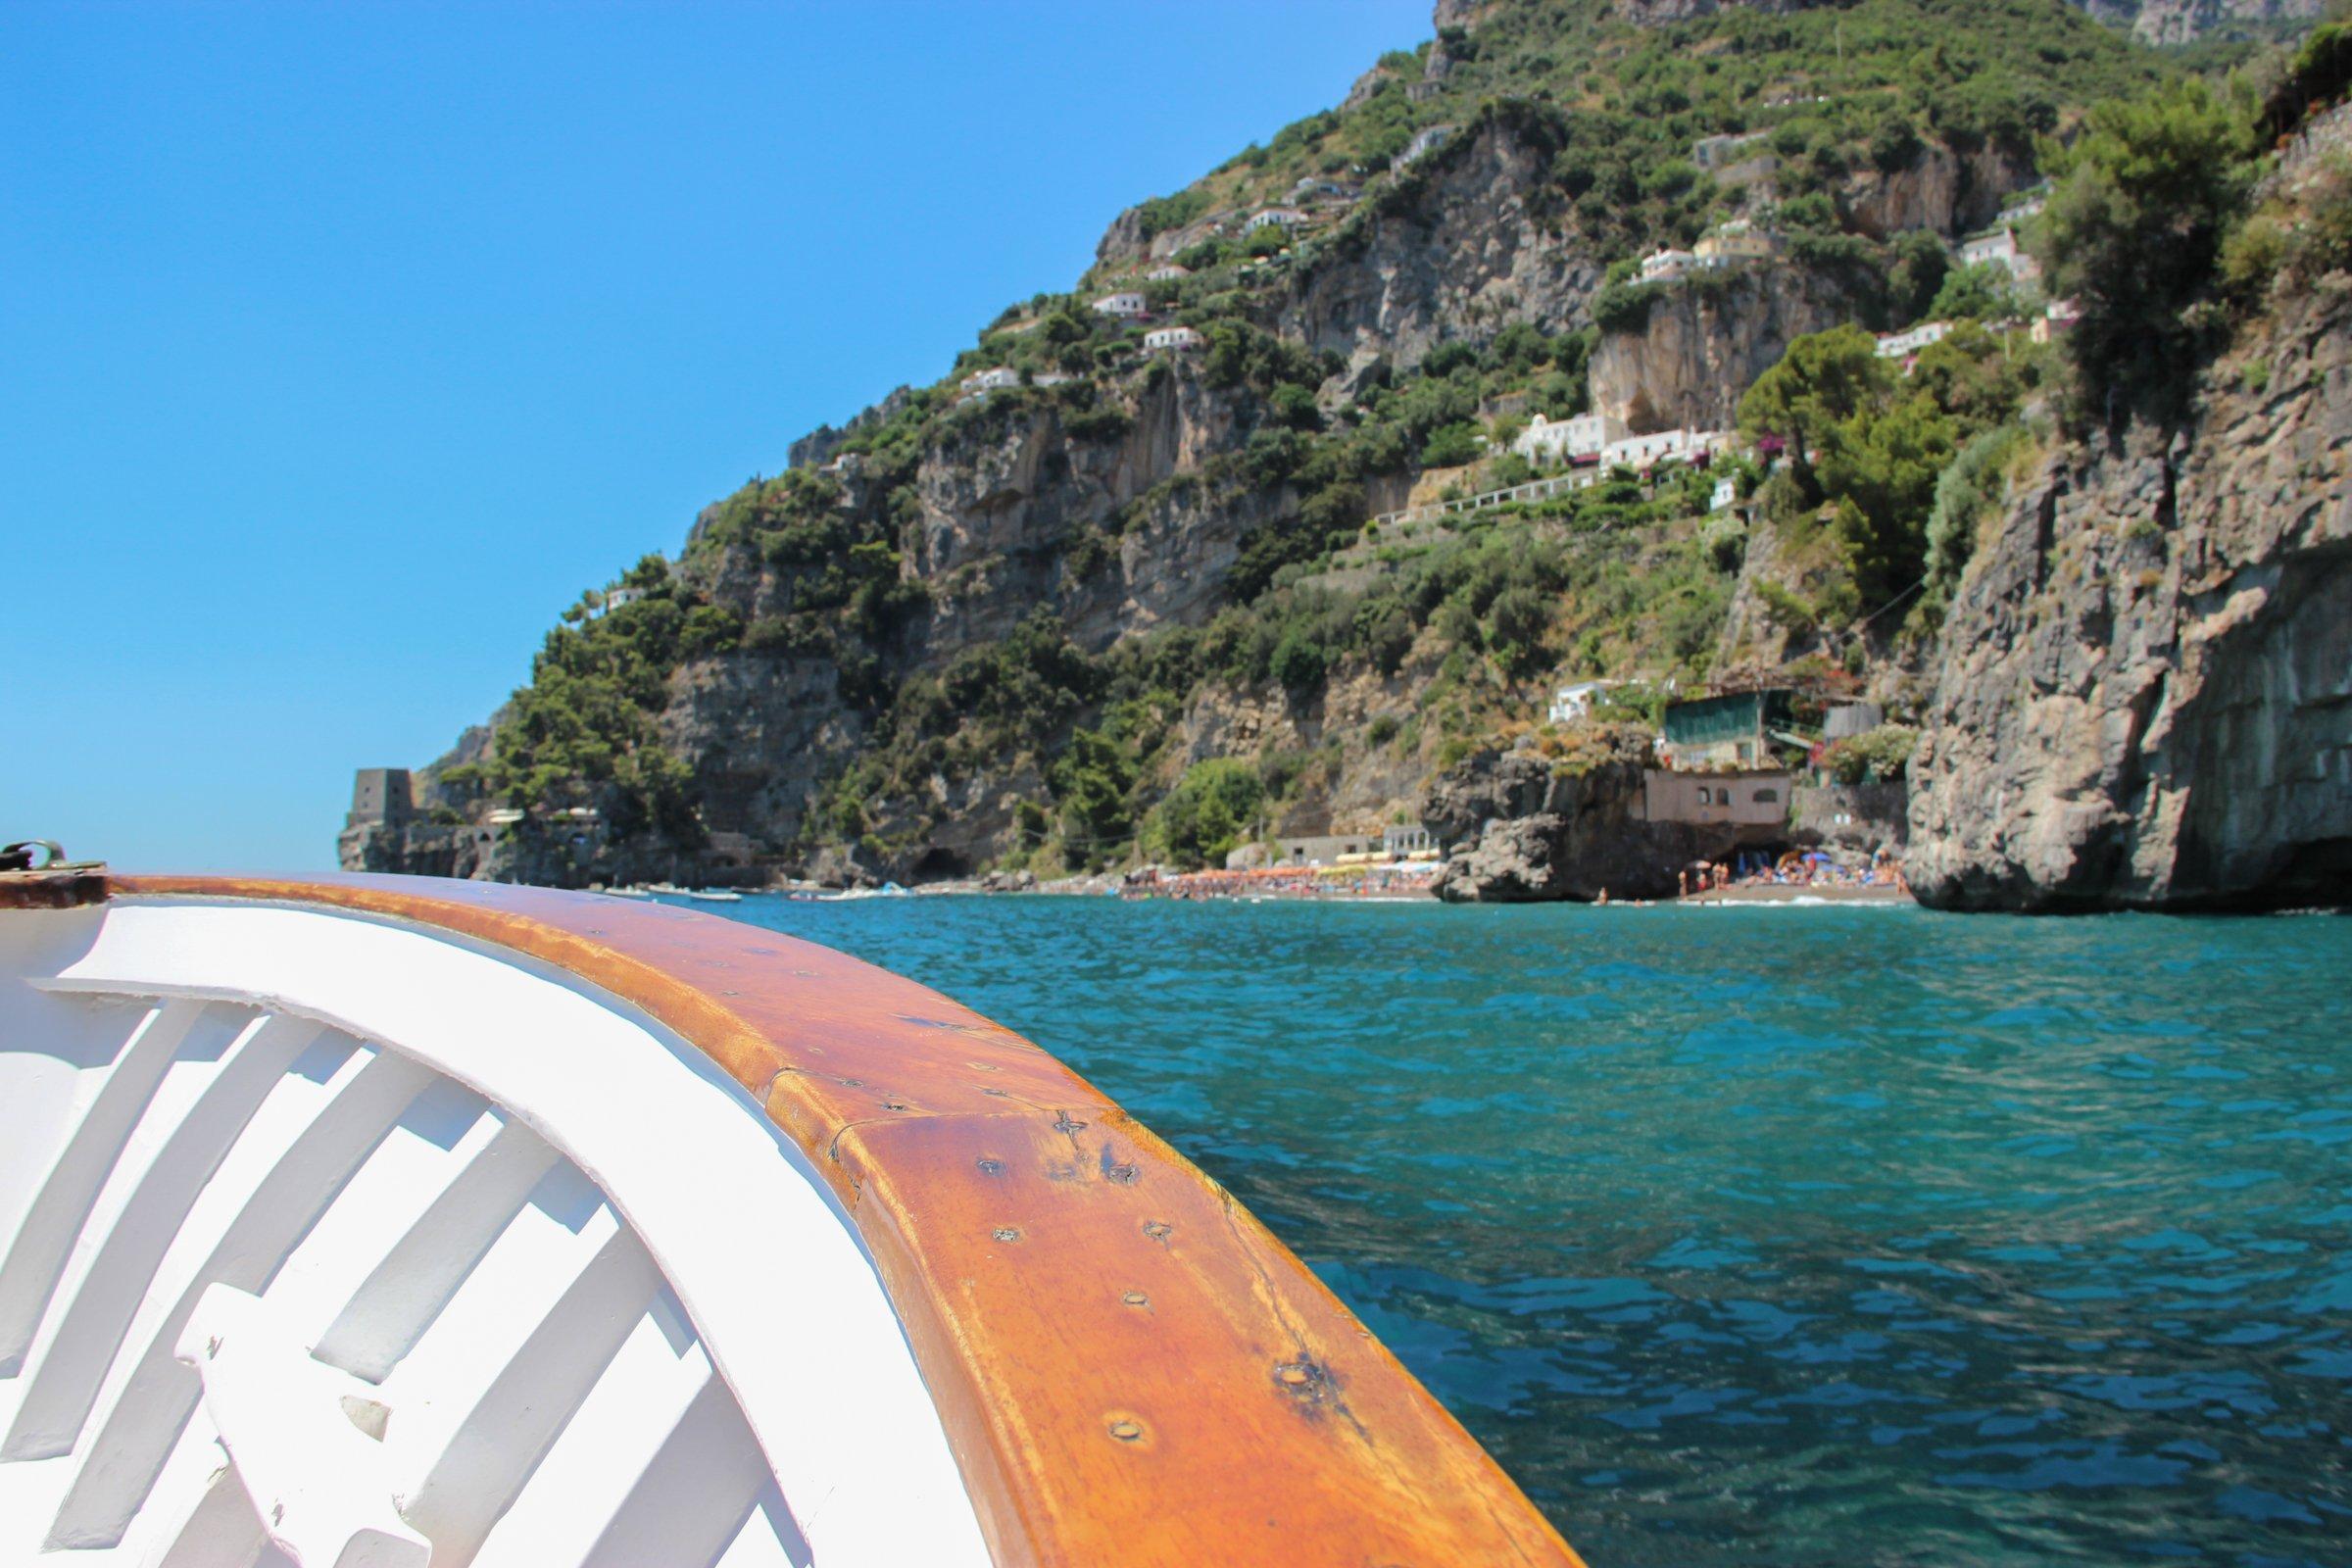 Edge Of Boat By Oceanside Cliffs